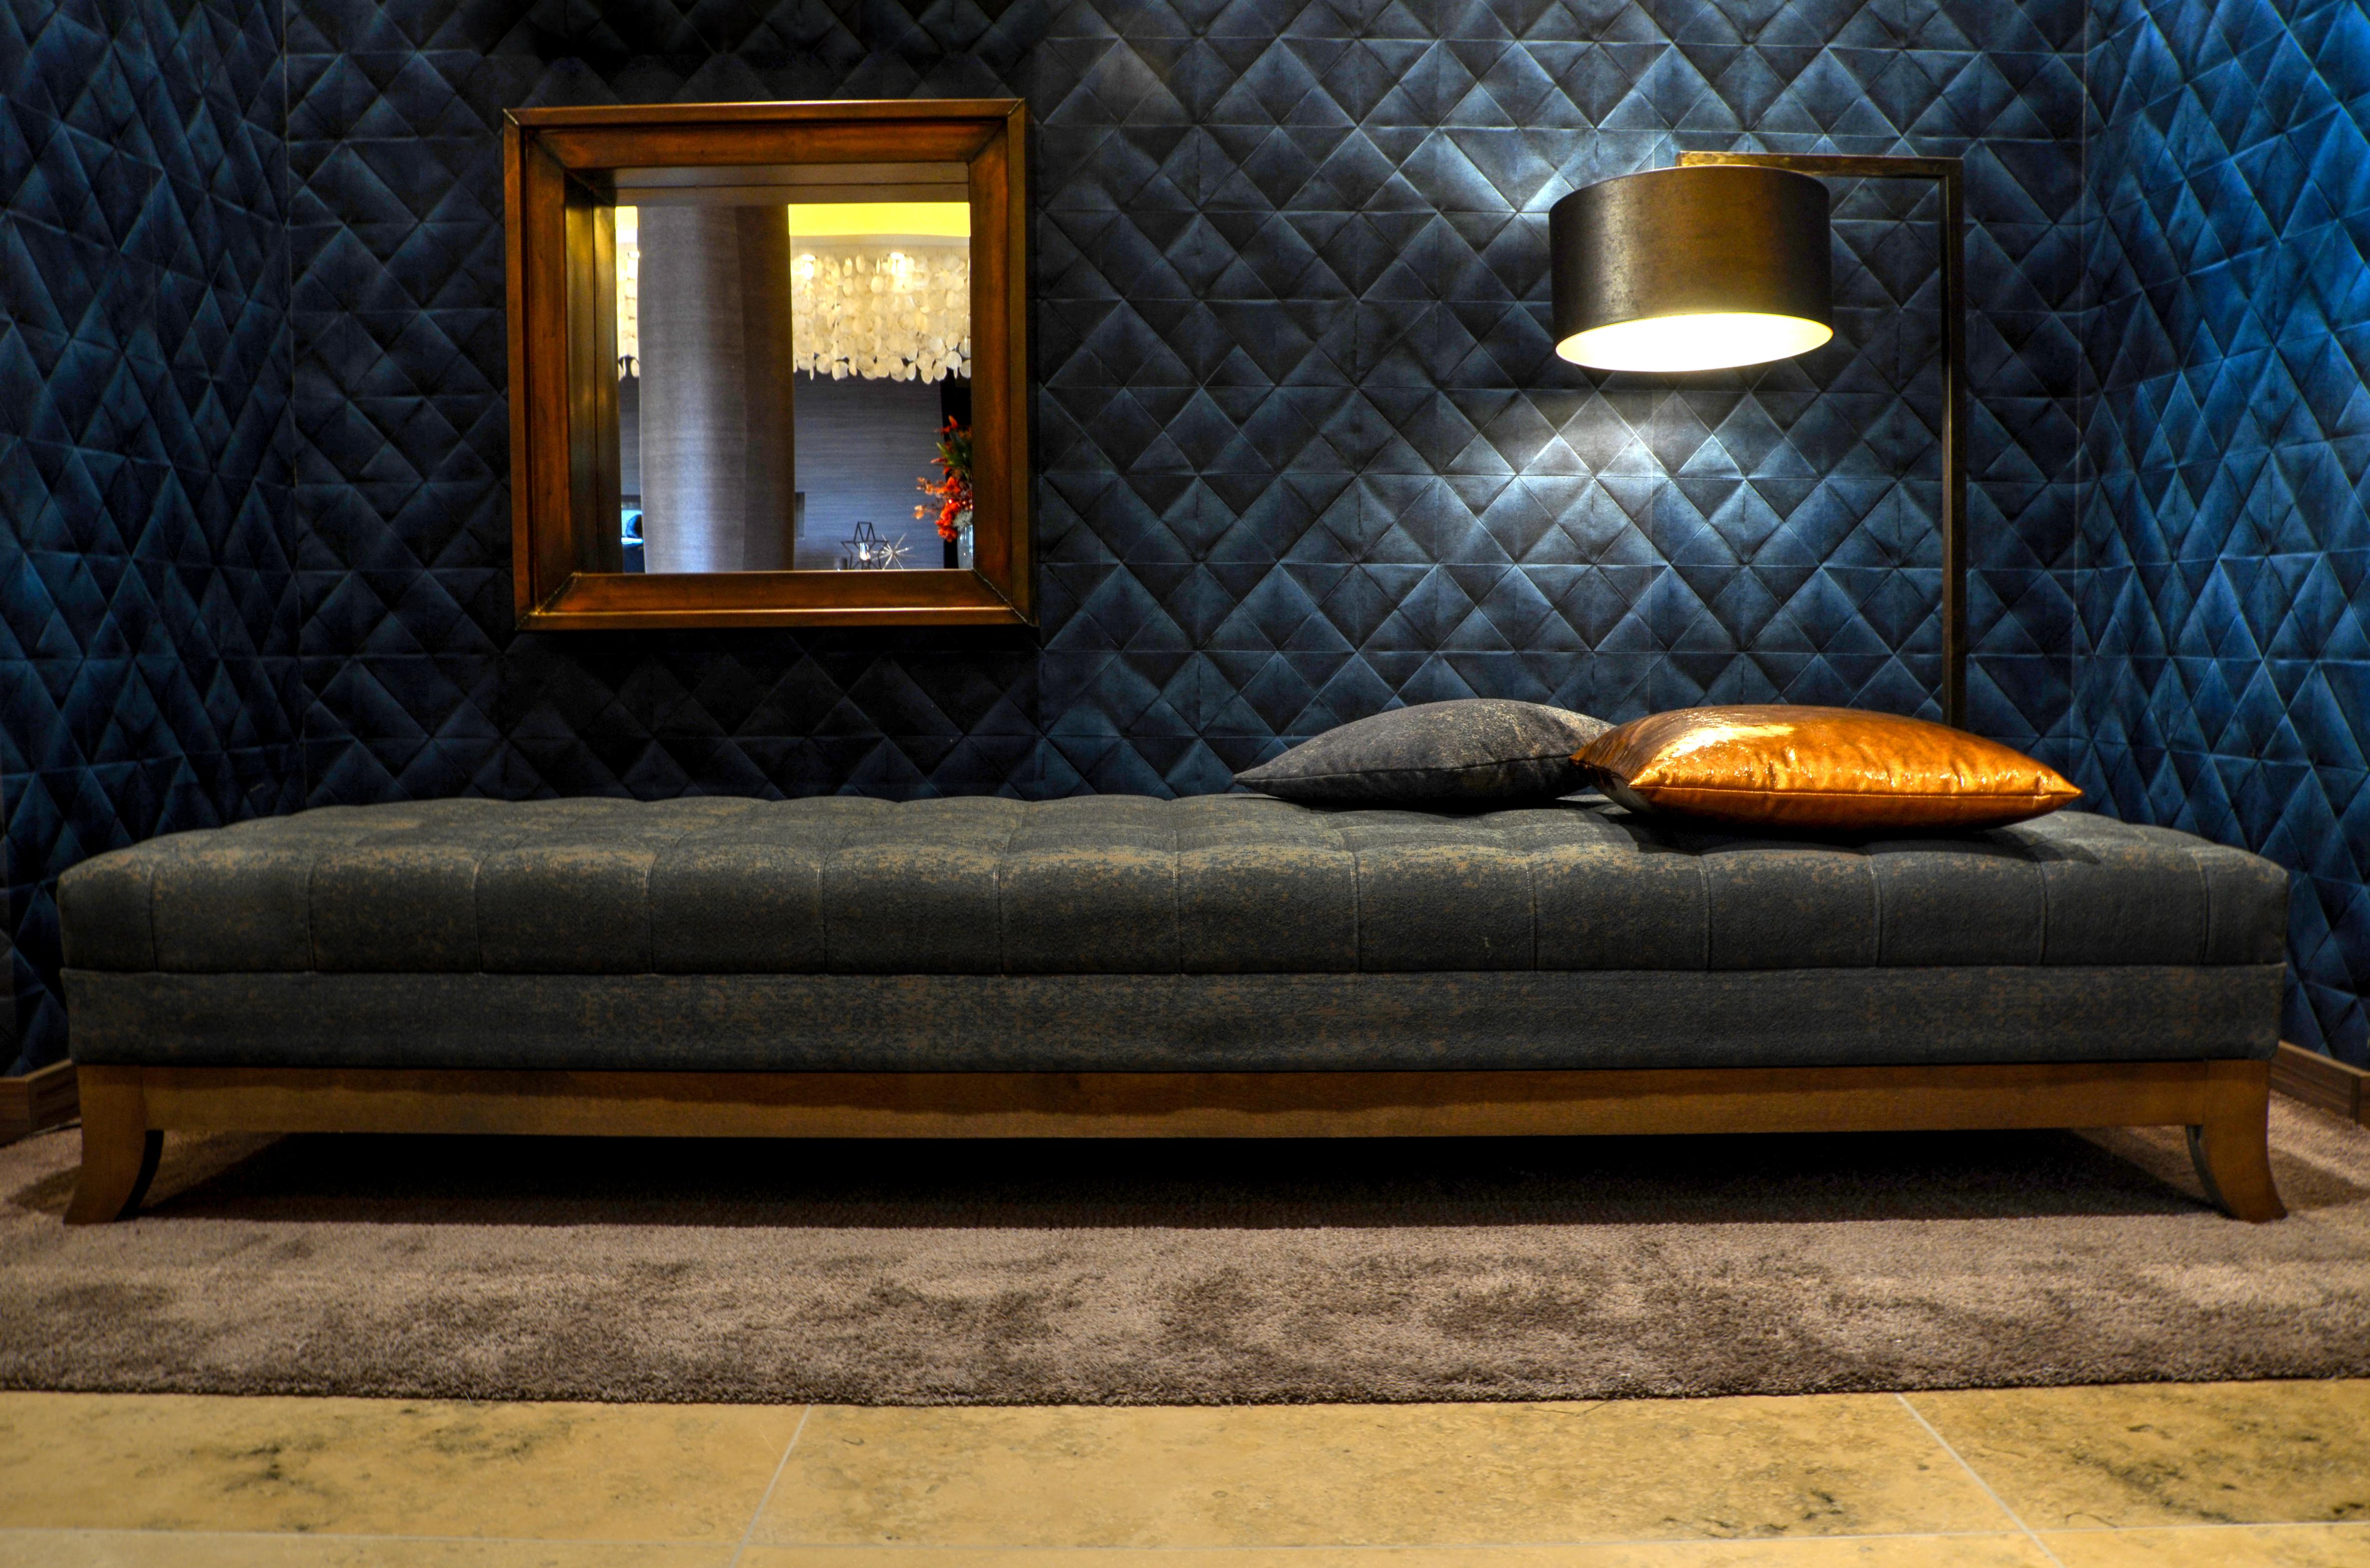 Free Images Wood Floor Living Room Furniture Bedroom Interior Design Hardwood Hotel Hostel Bed Frame Studio Couch 4732x3131 961411 Free Stock Photos Pxhere